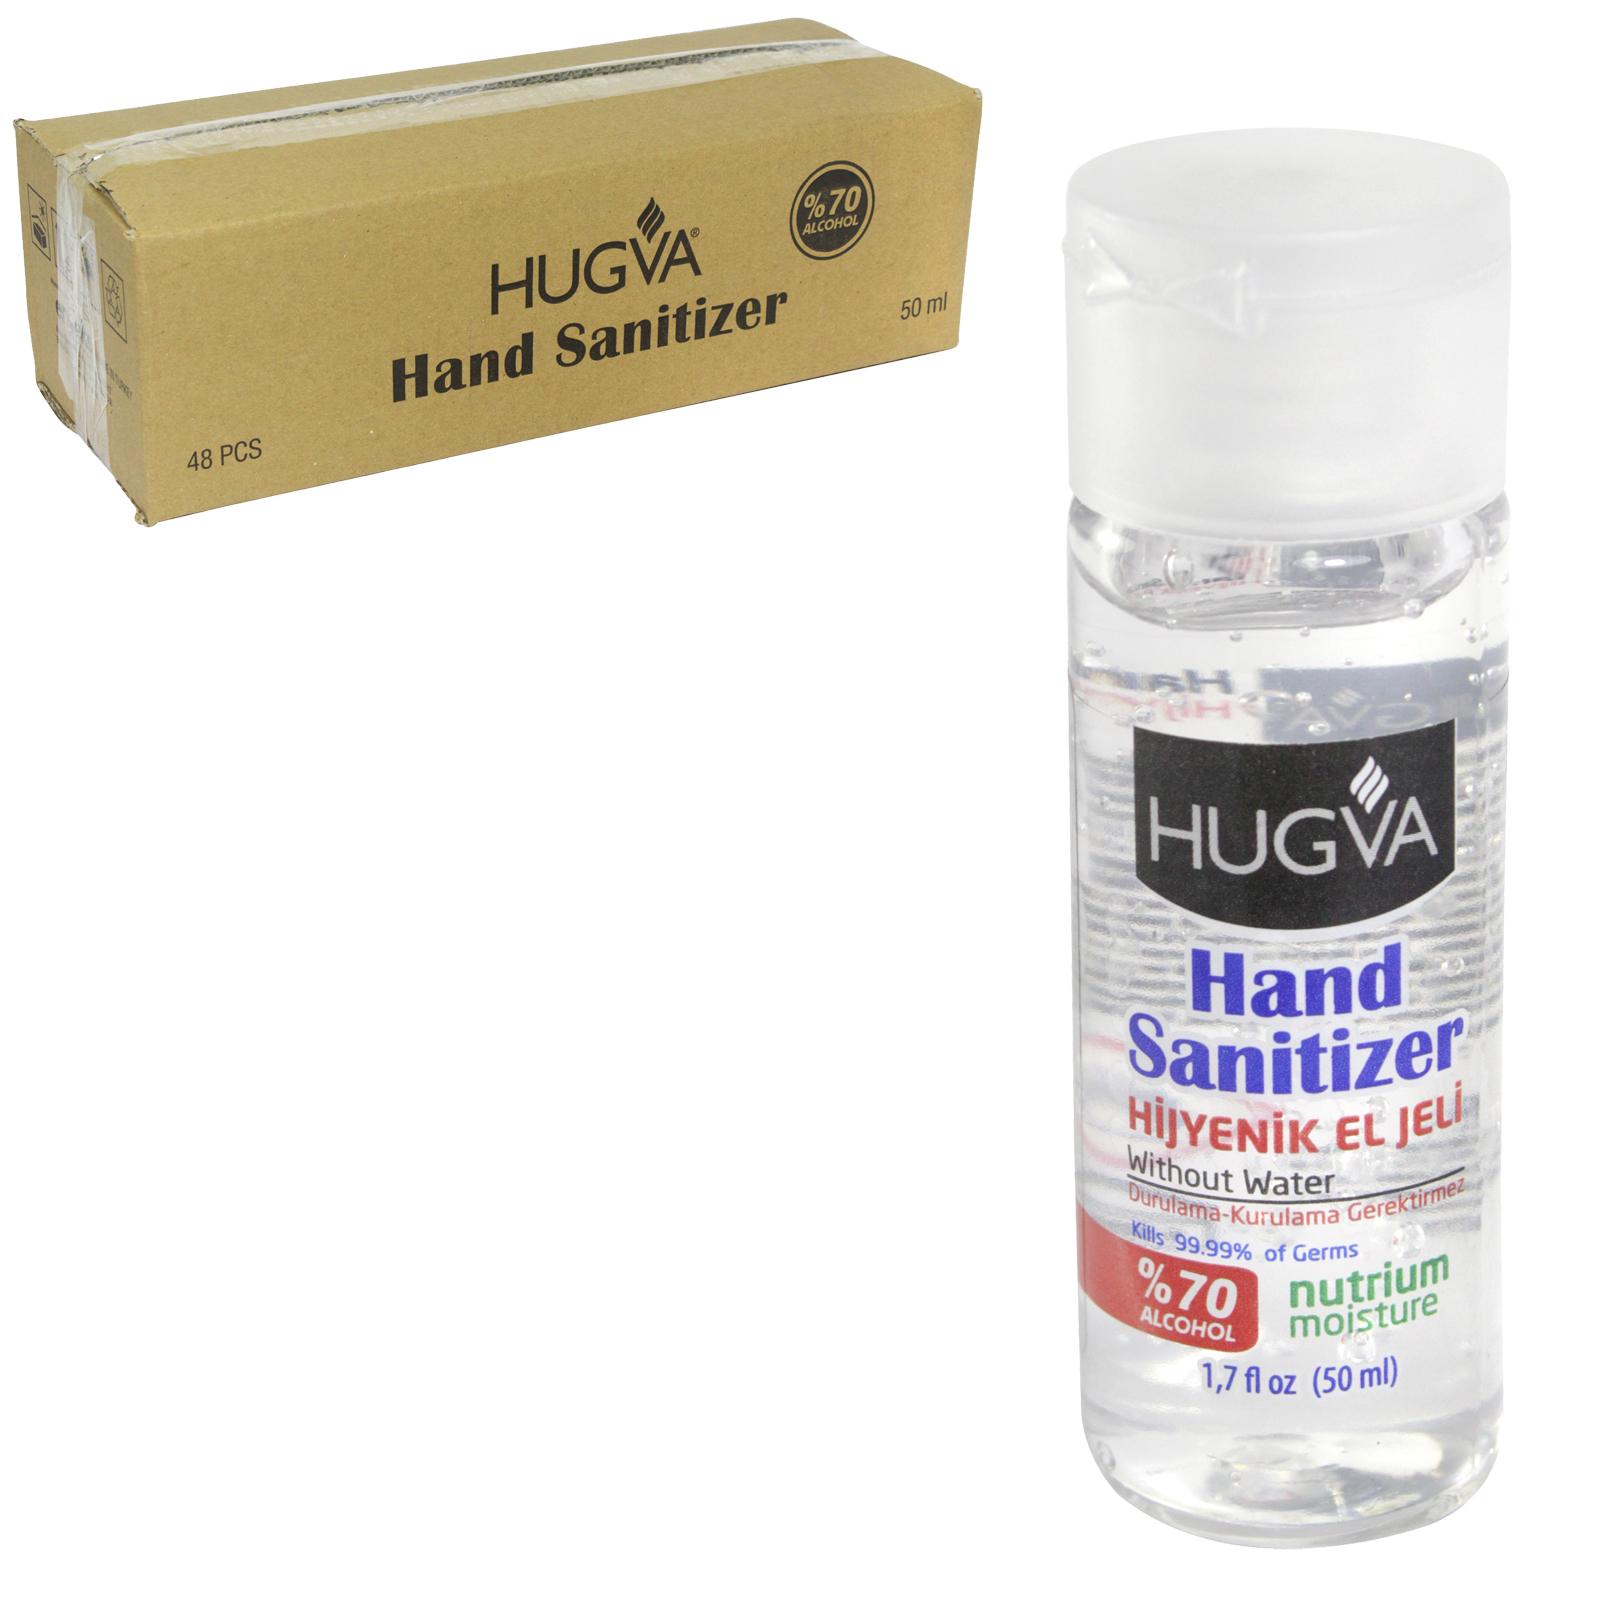 HUGVA HAND SANITIZER 50ML 70% ALCOHOL X48